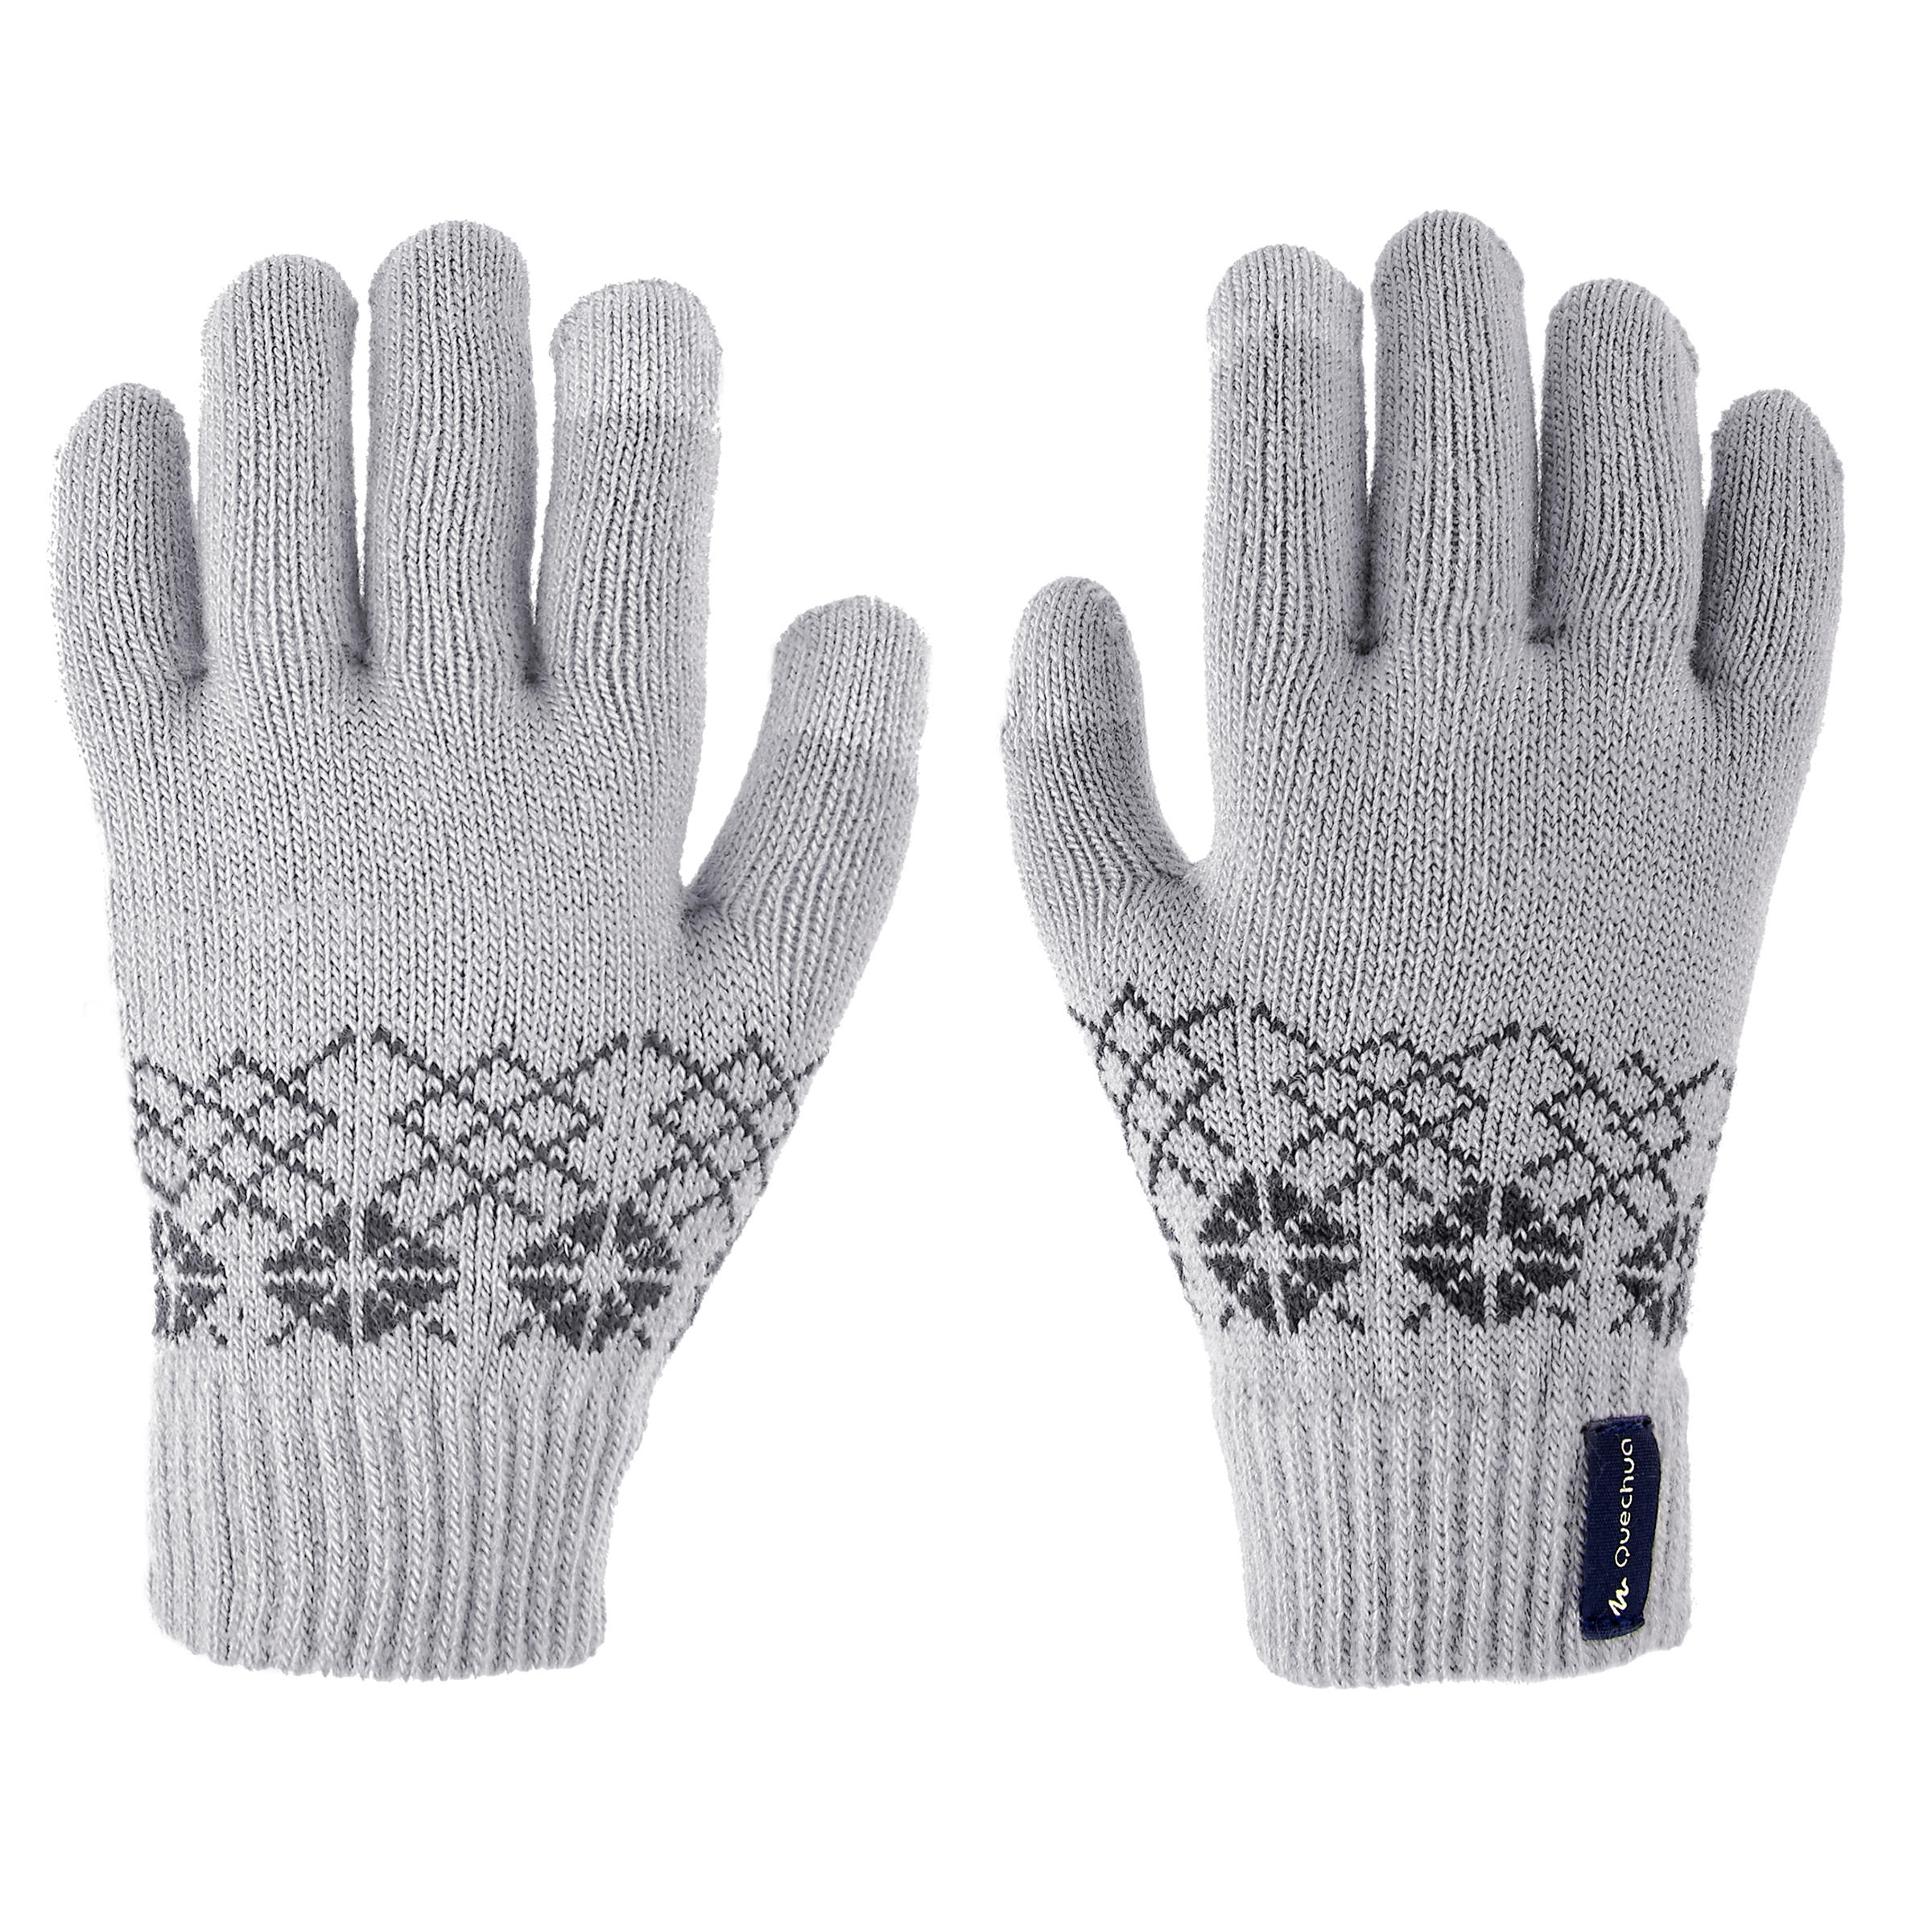 SH100 Warm Child's Hiking Knit Gloves-Grey